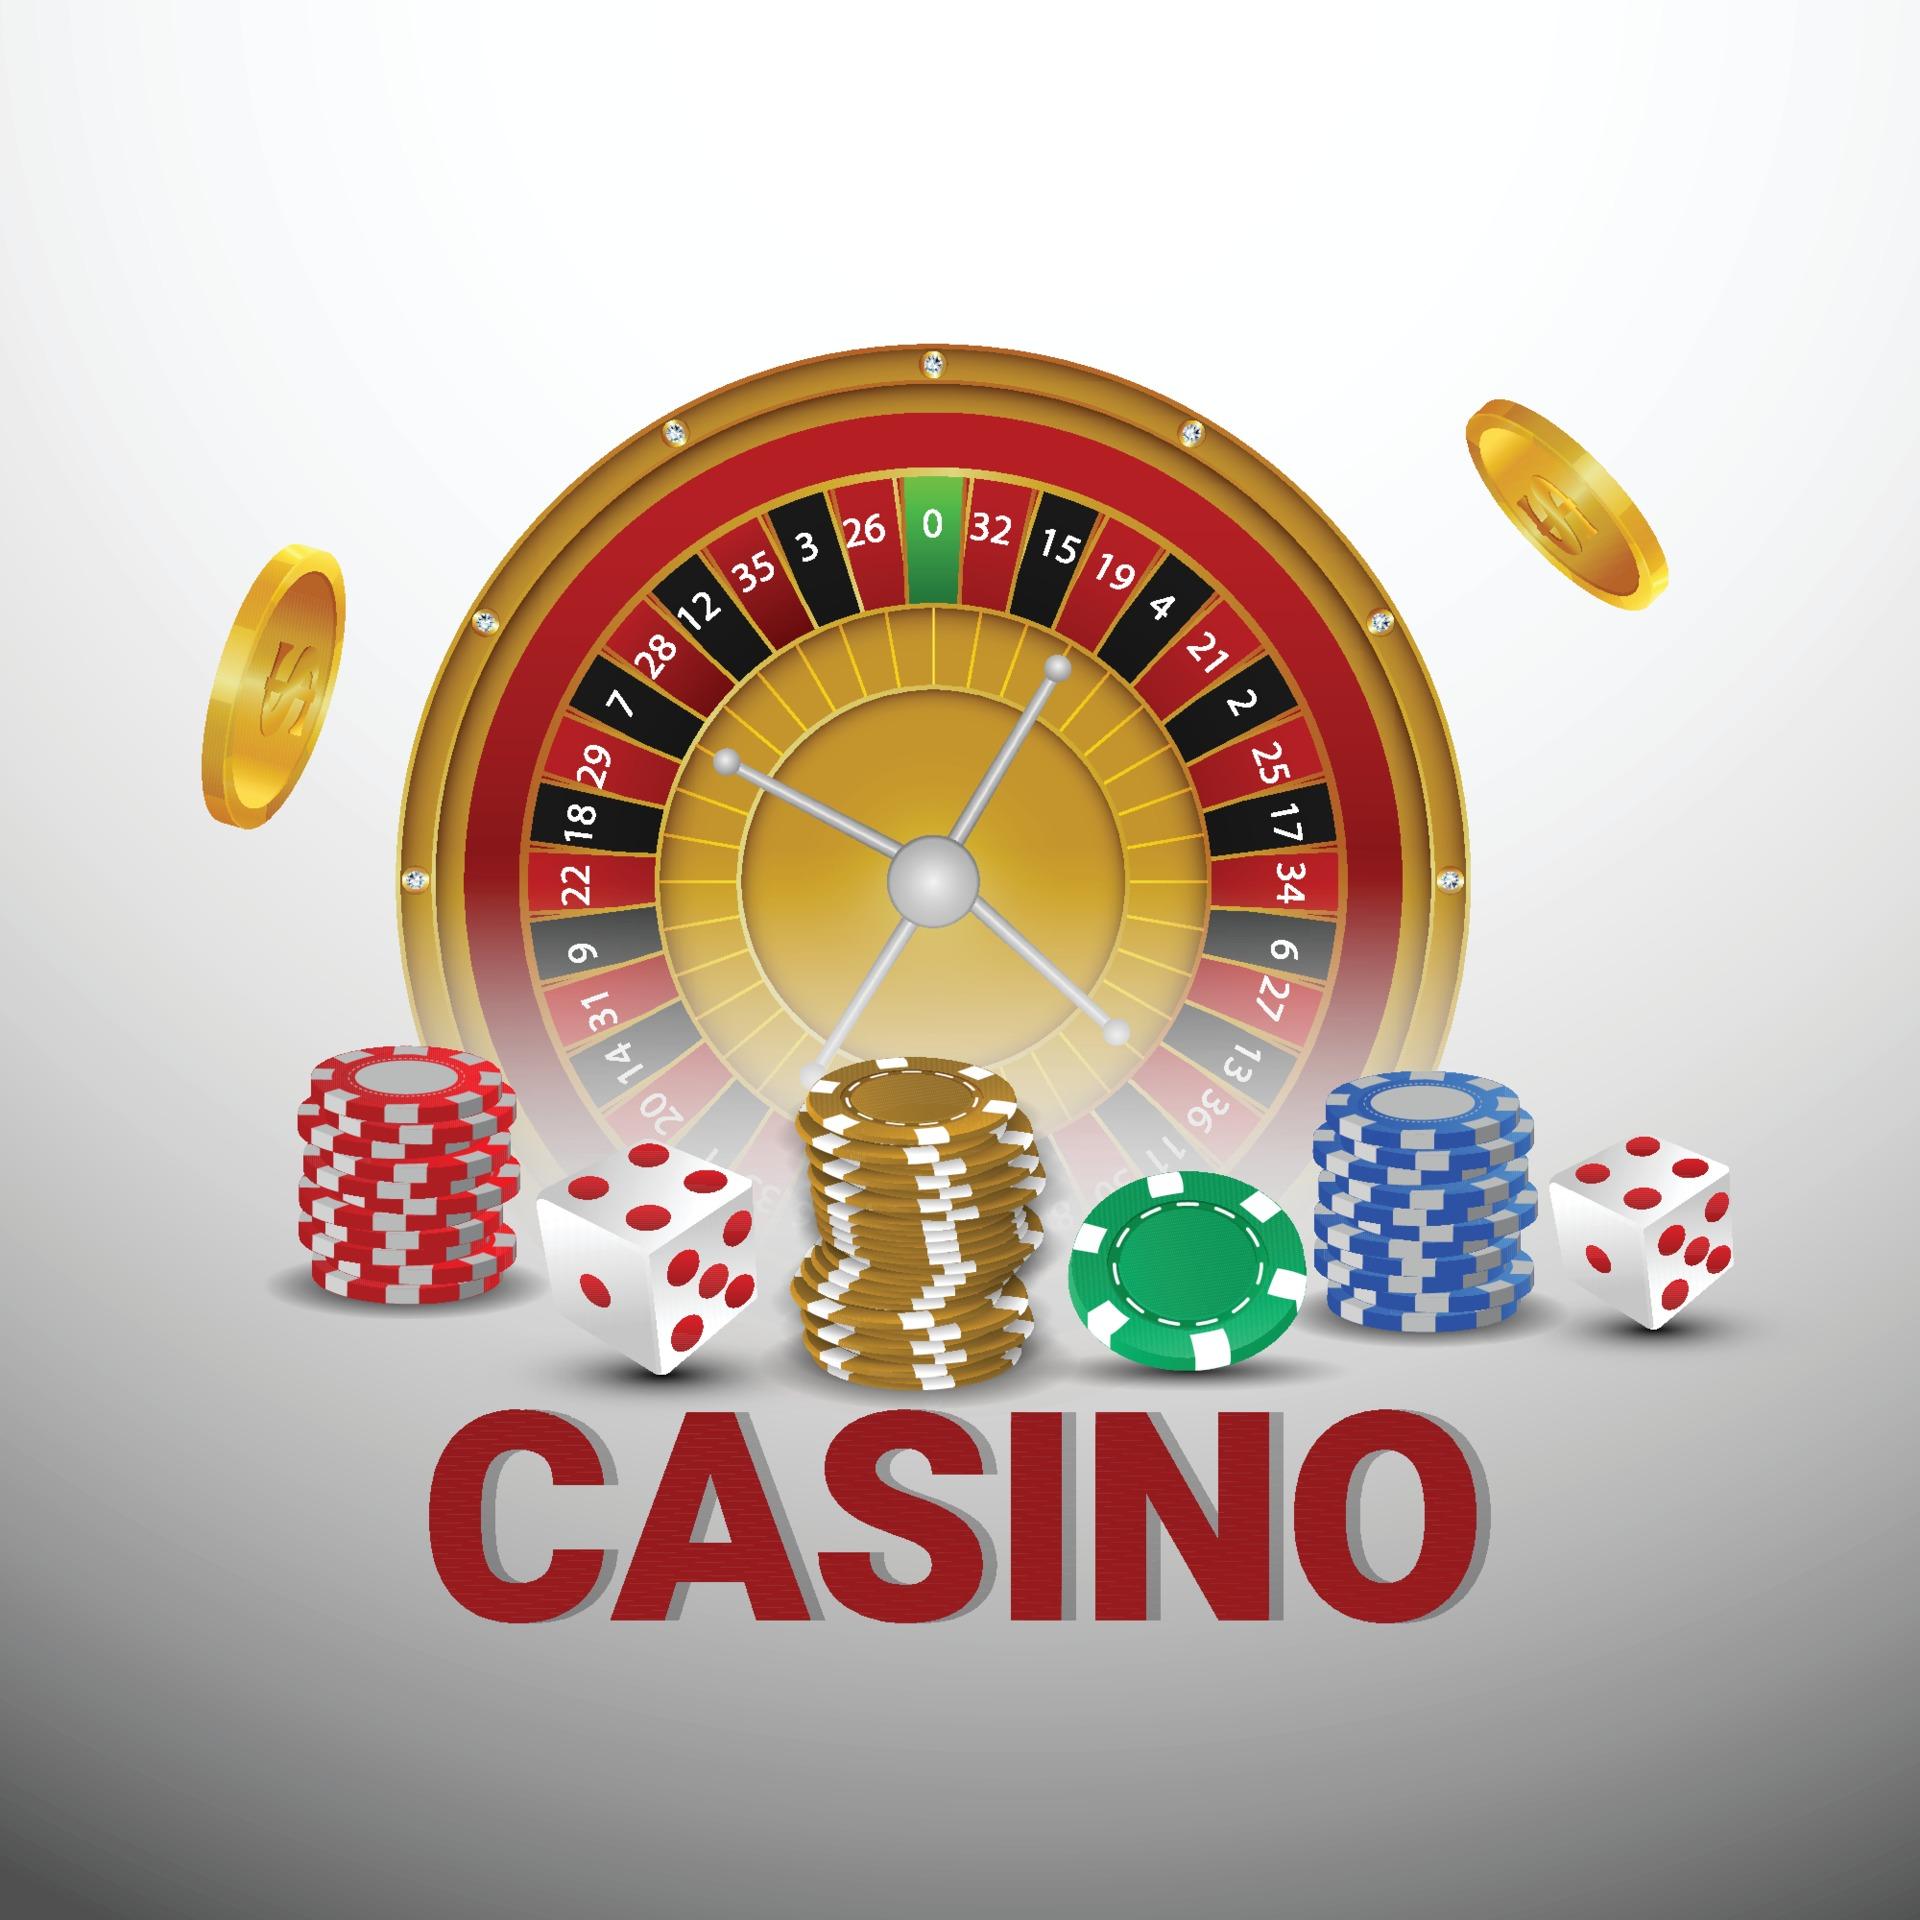 Las Vegas strip hotels 365029